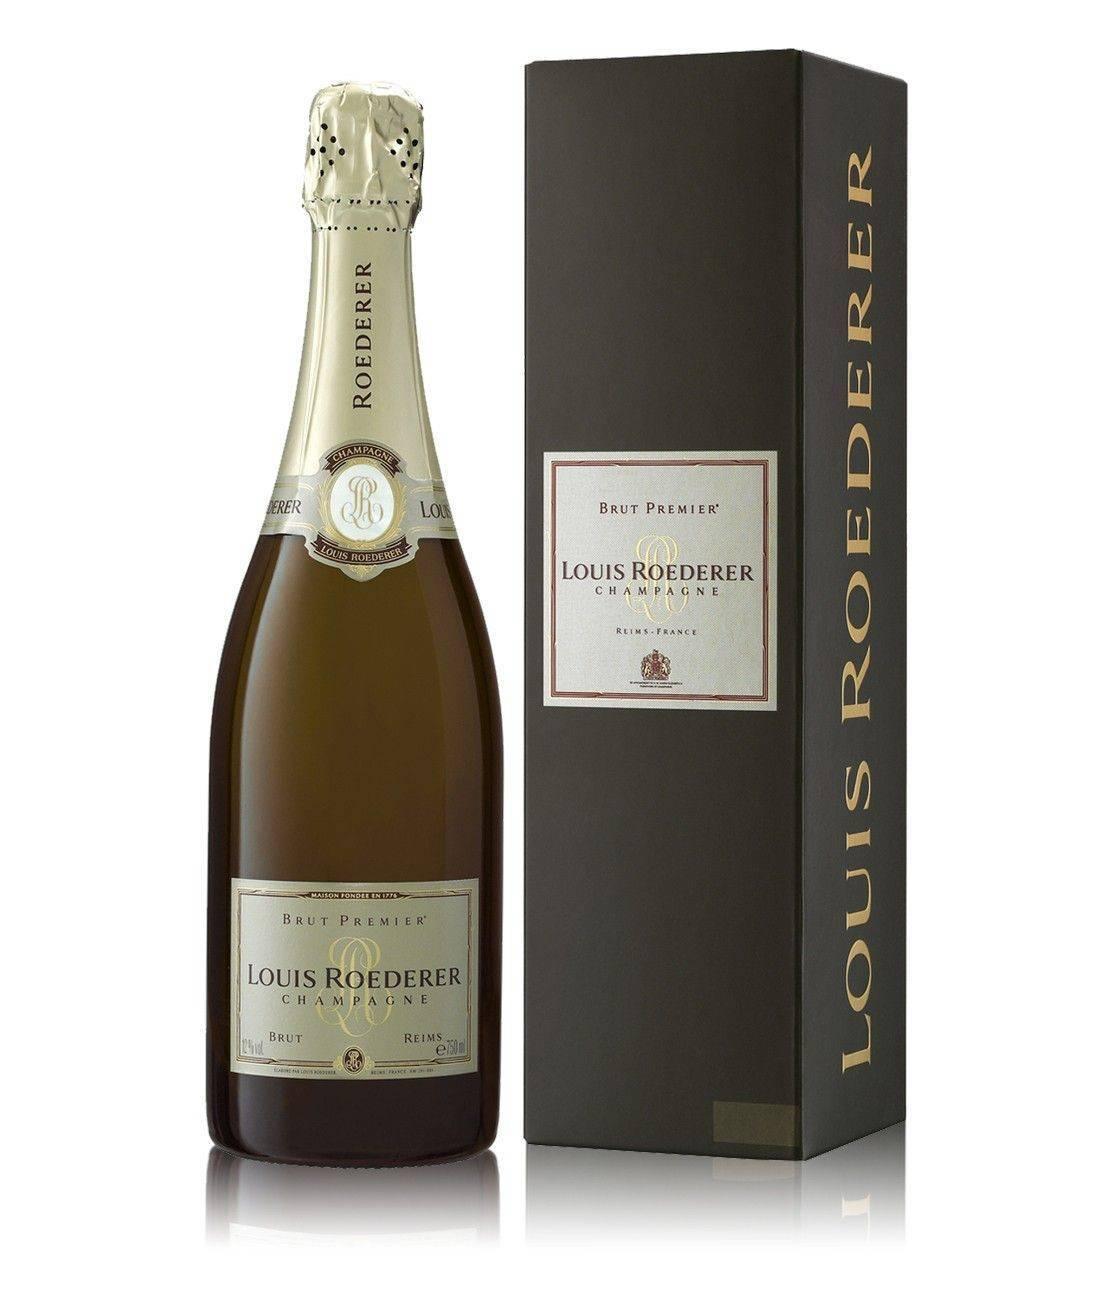 Обзор шампанского Louis Roederer Brut Premier